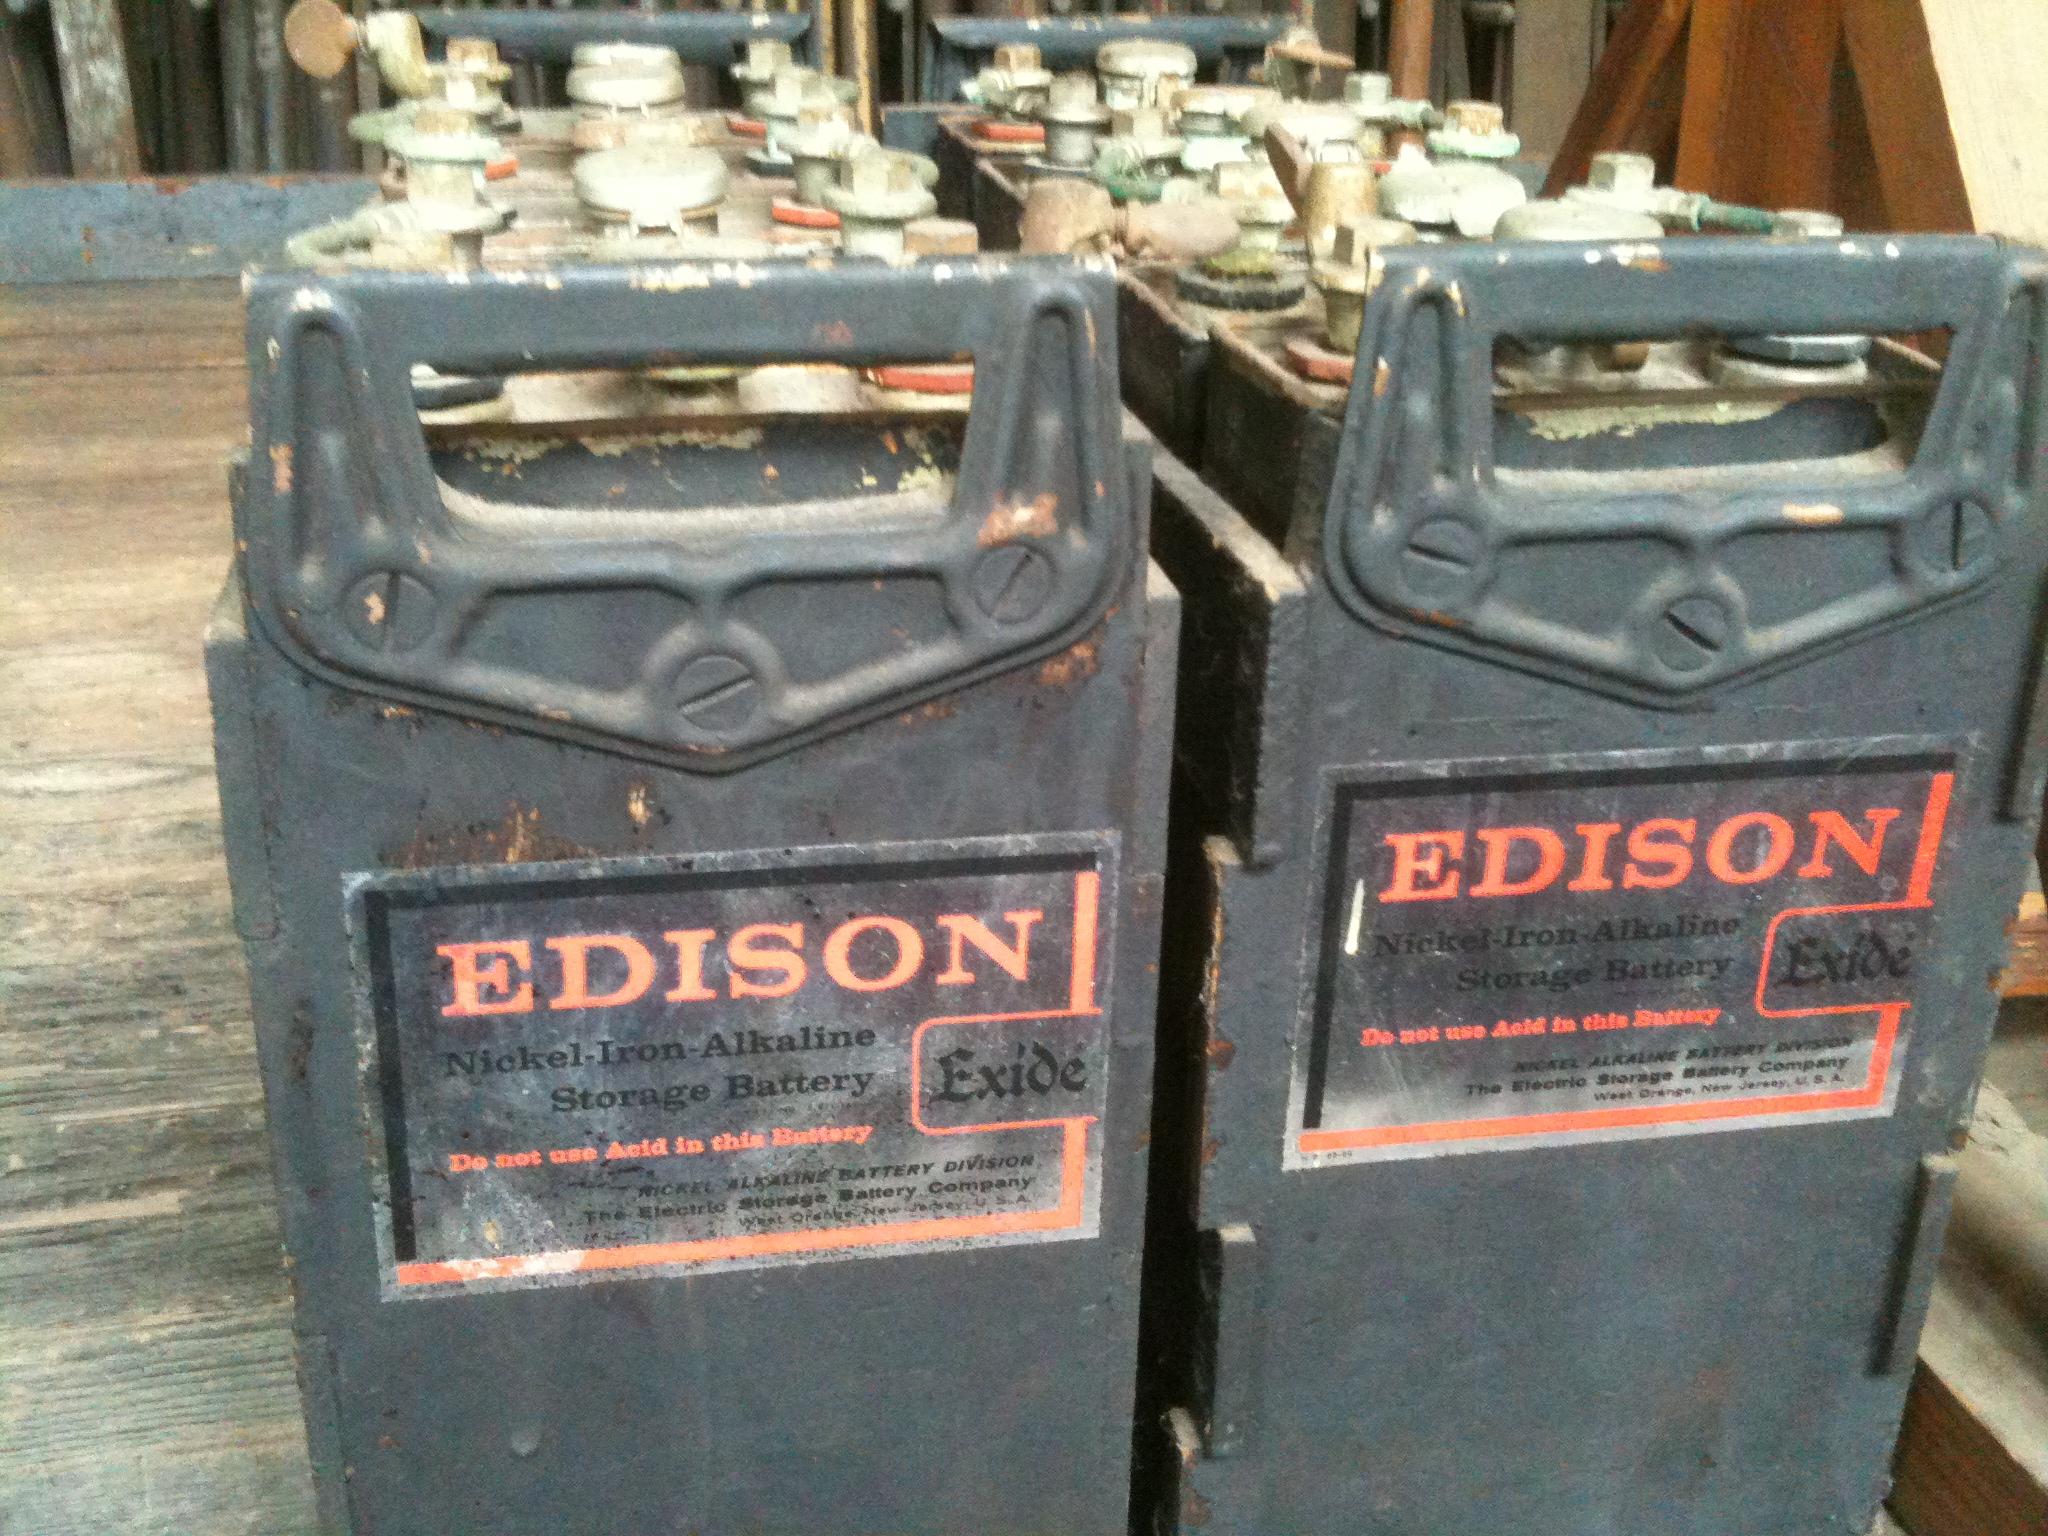 Thomas Edison S Nickel鈥搃ron Batteries